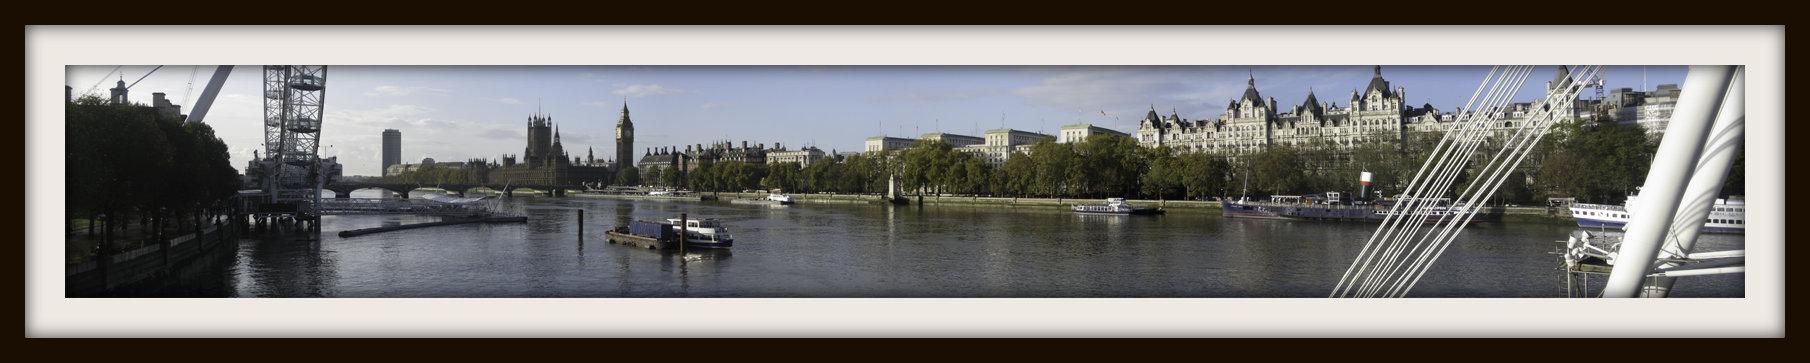 London Panorama by TarJakArt